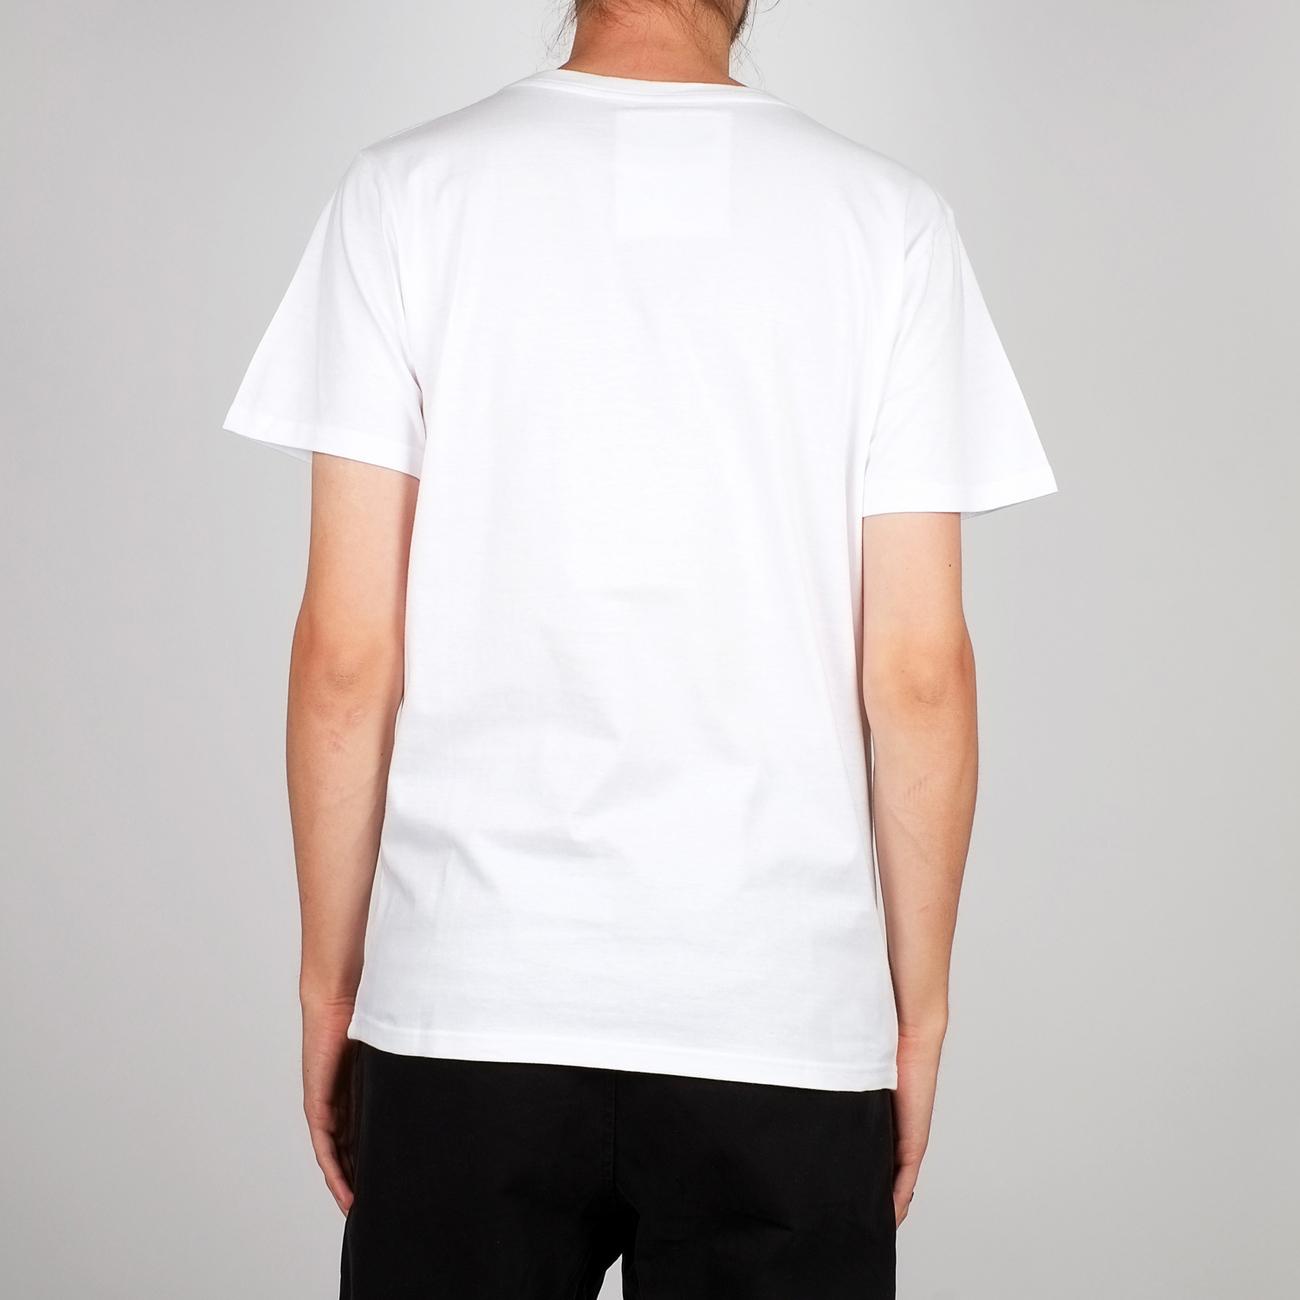 T-shirt Stockholm Lynch